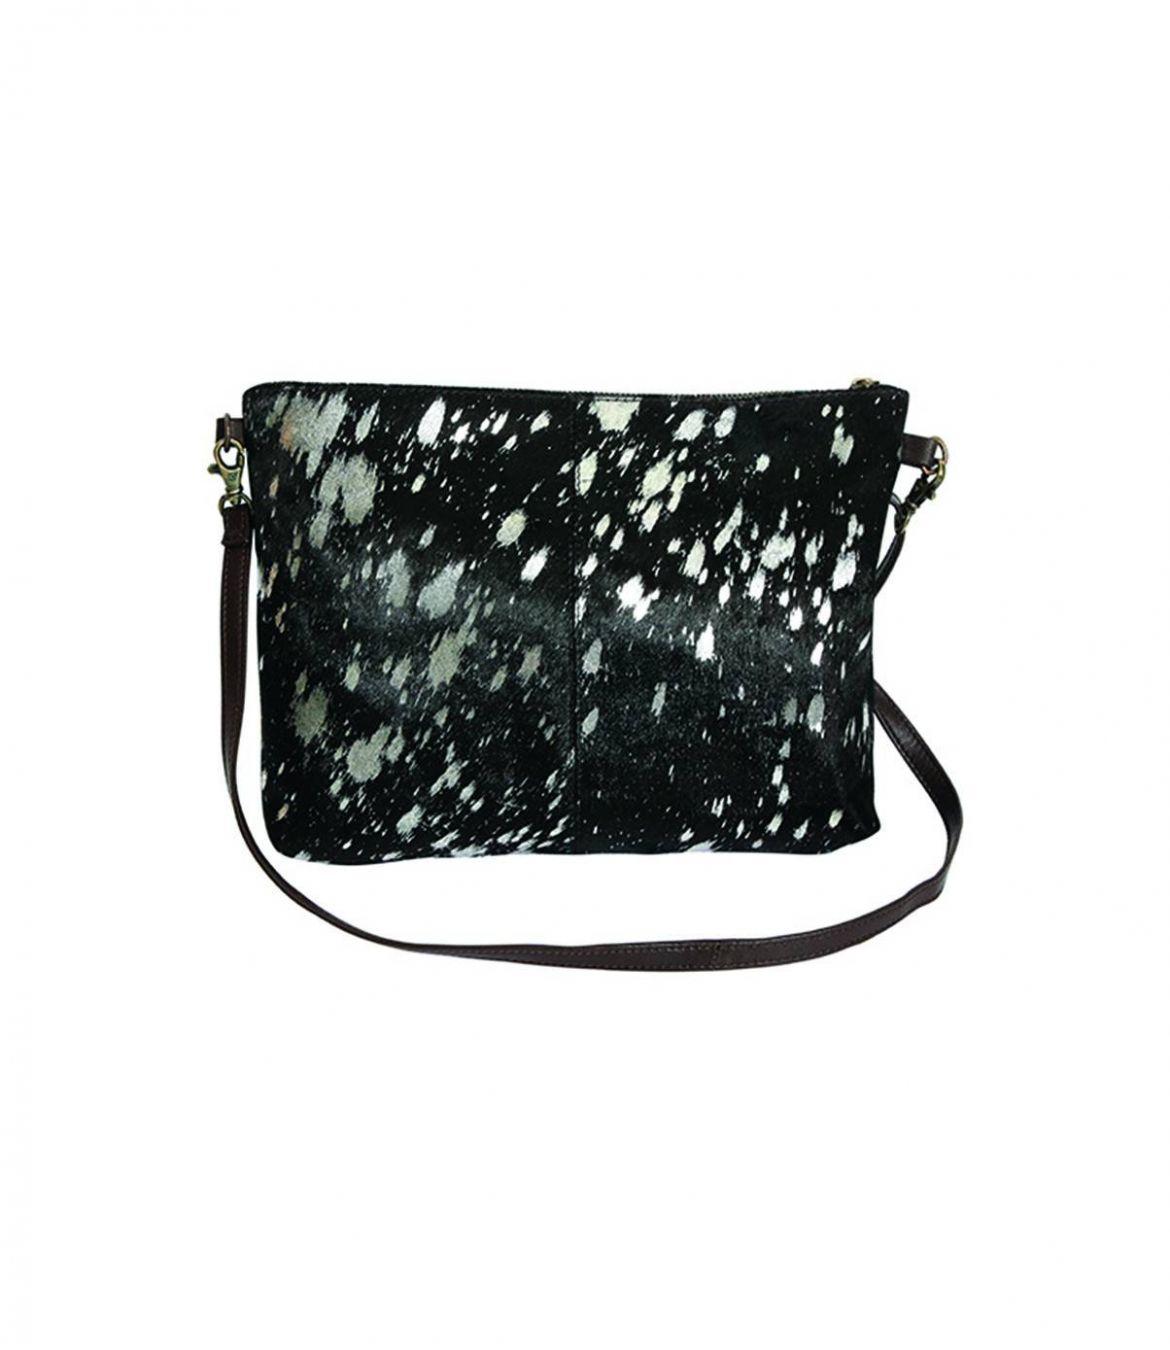 AFI Women's Leather Bag 22x28 cm Storiatipic - 1